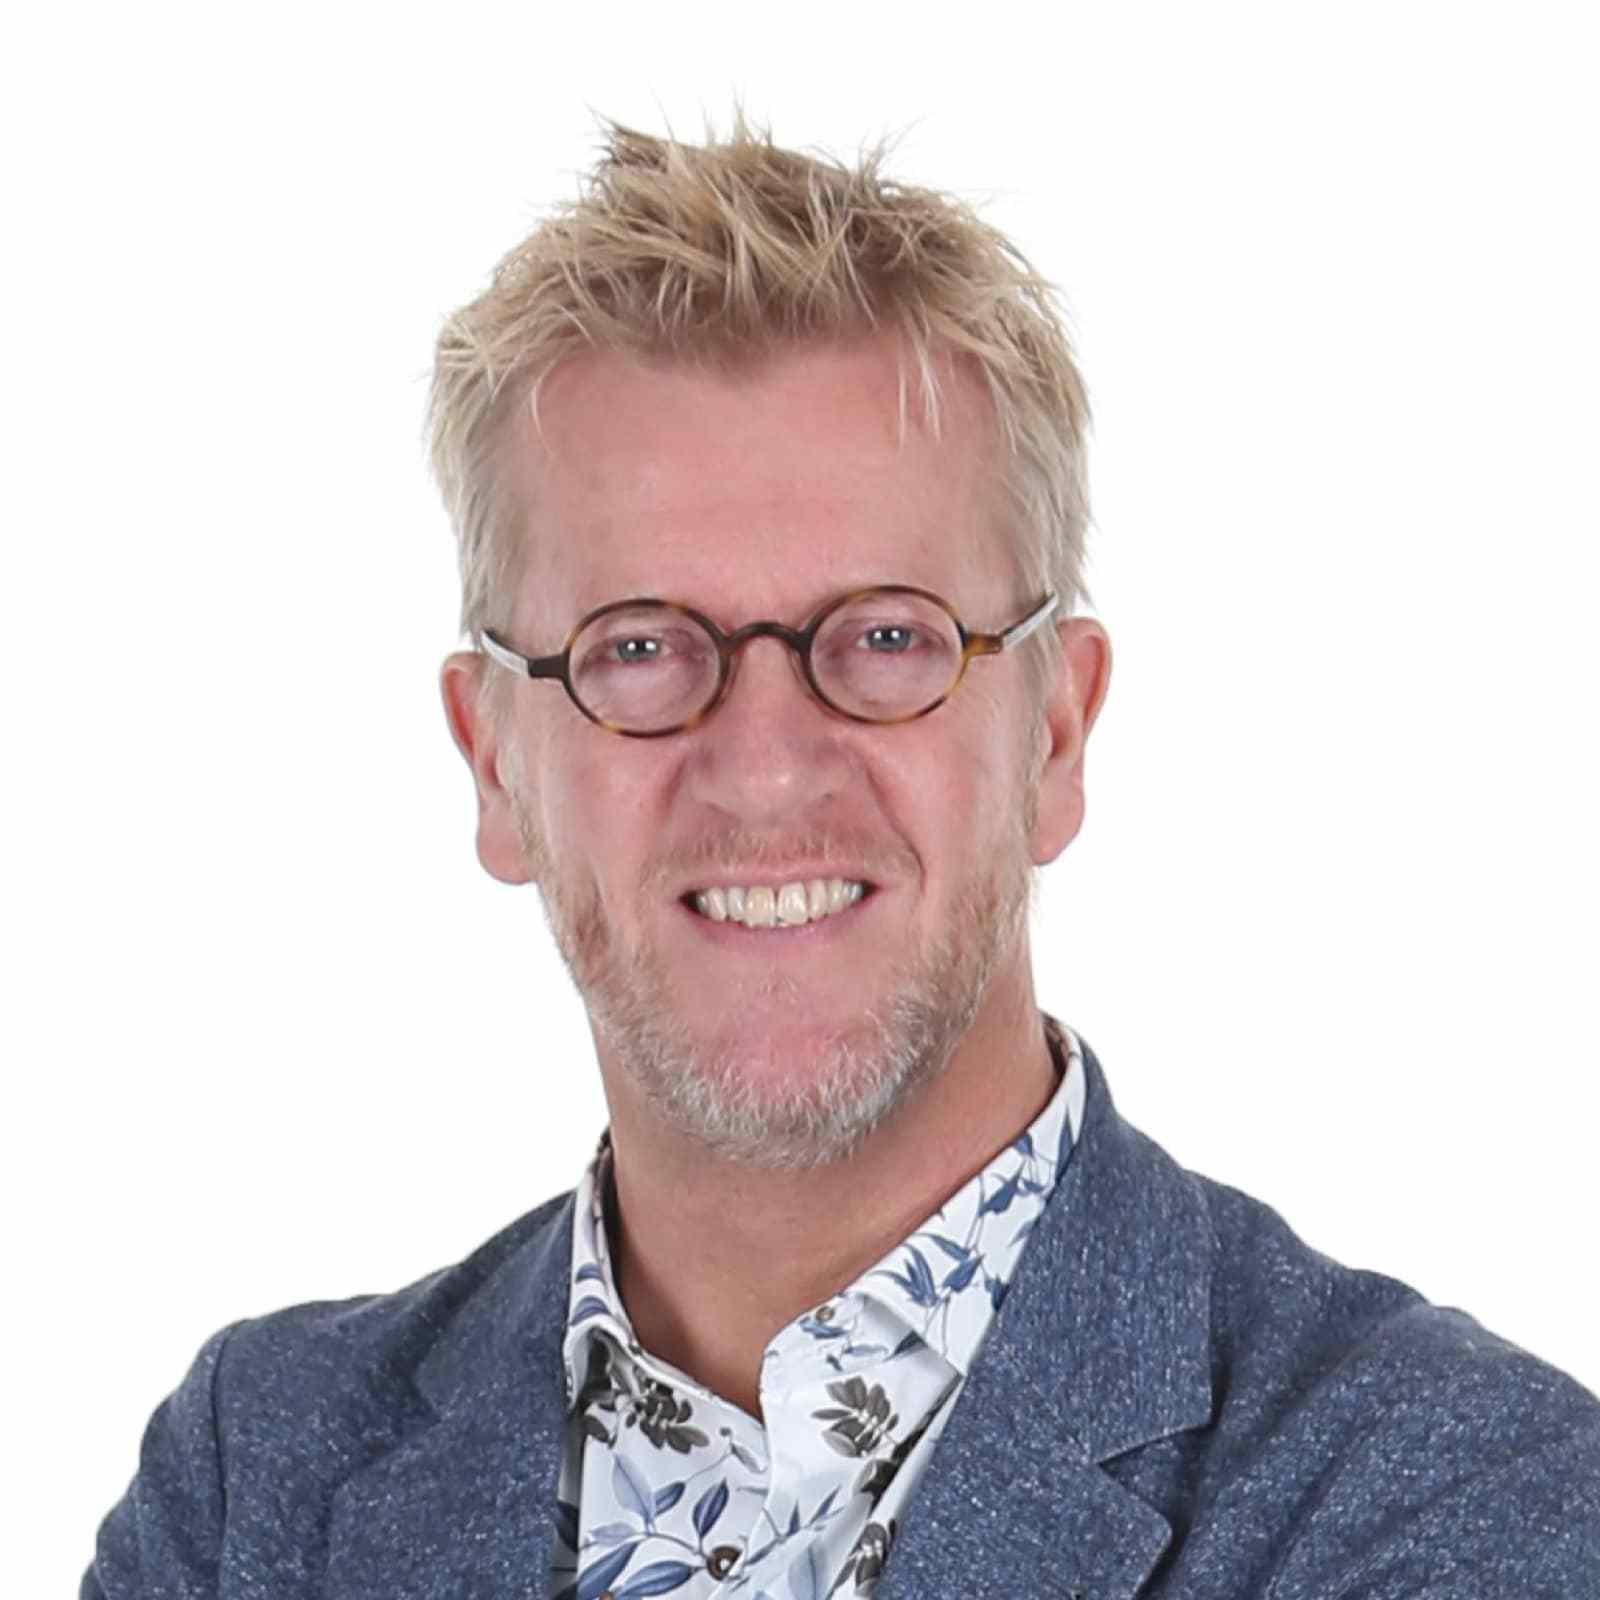 Reinoud Wieling - MKB Adviseur, financieel specialist en boekhouder in Enschede